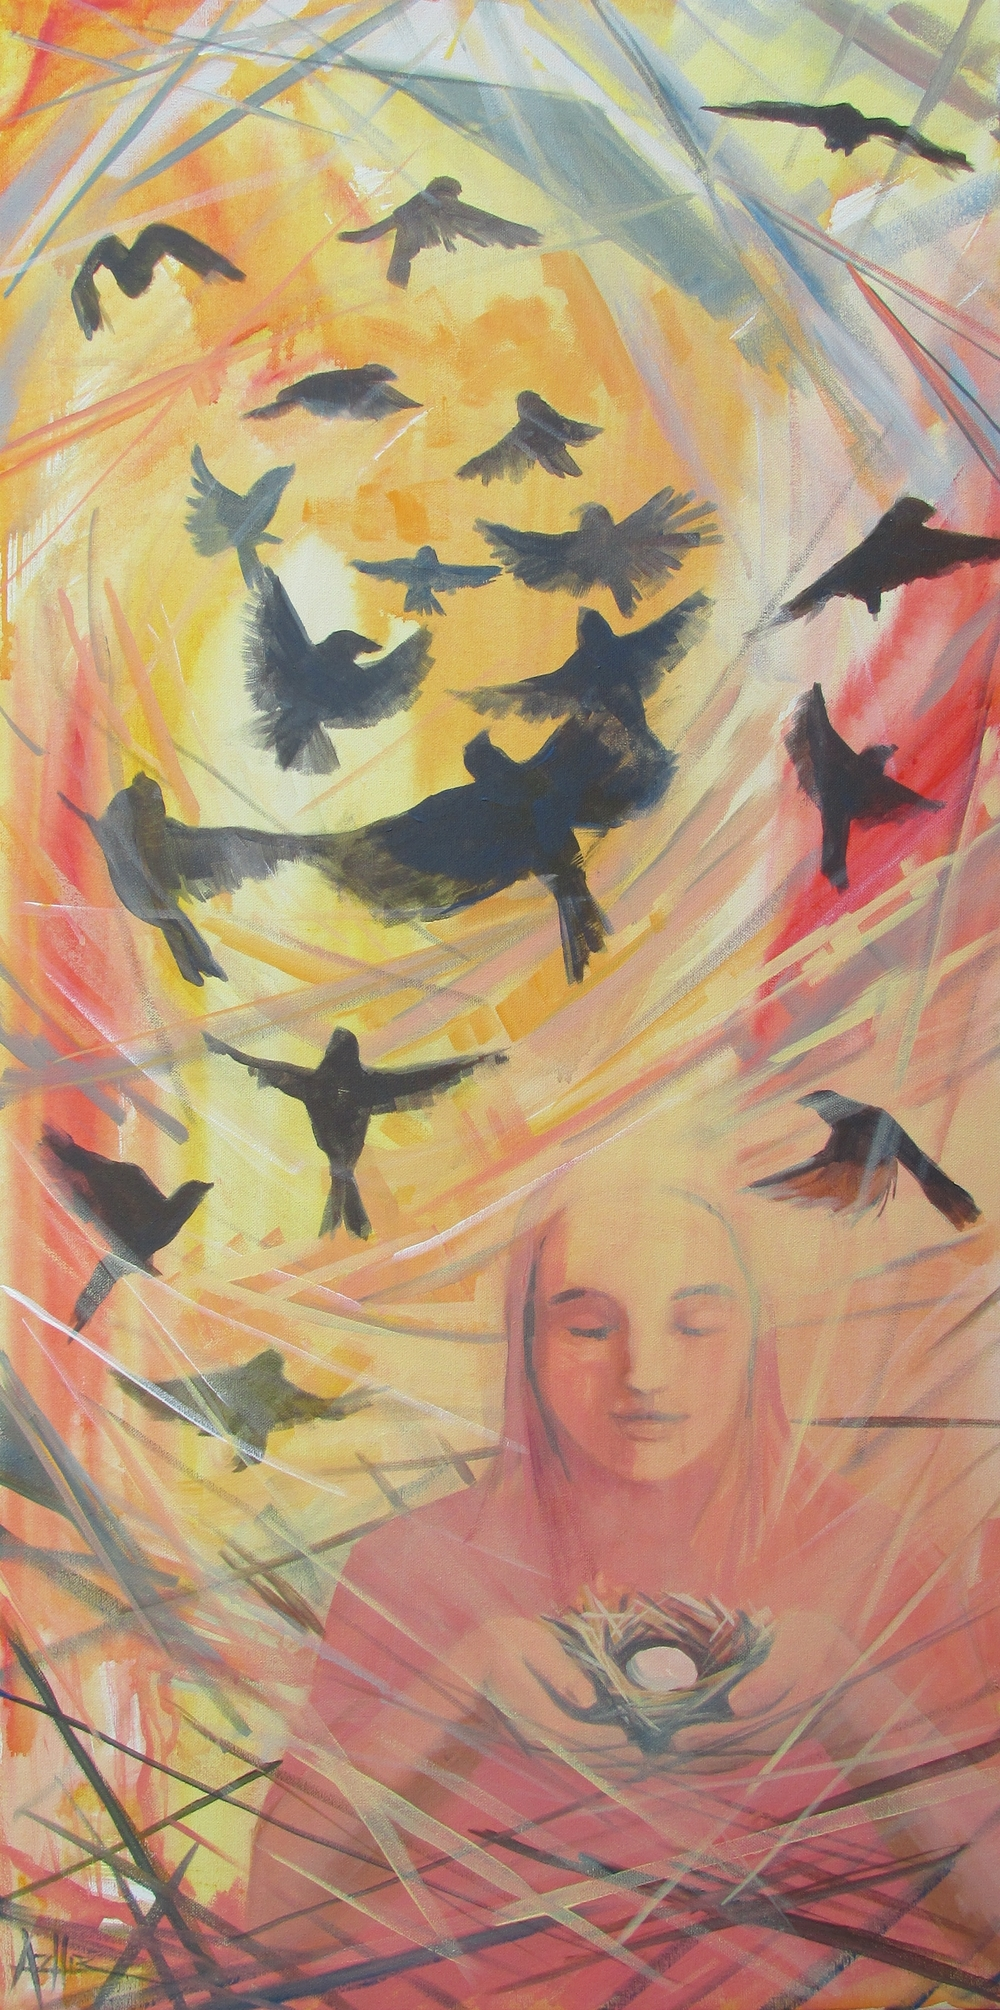 "SOLD, The Birds of Syria, Copyright 2015 Hirschten, Acrylic on Canvas 18"" x 36"""